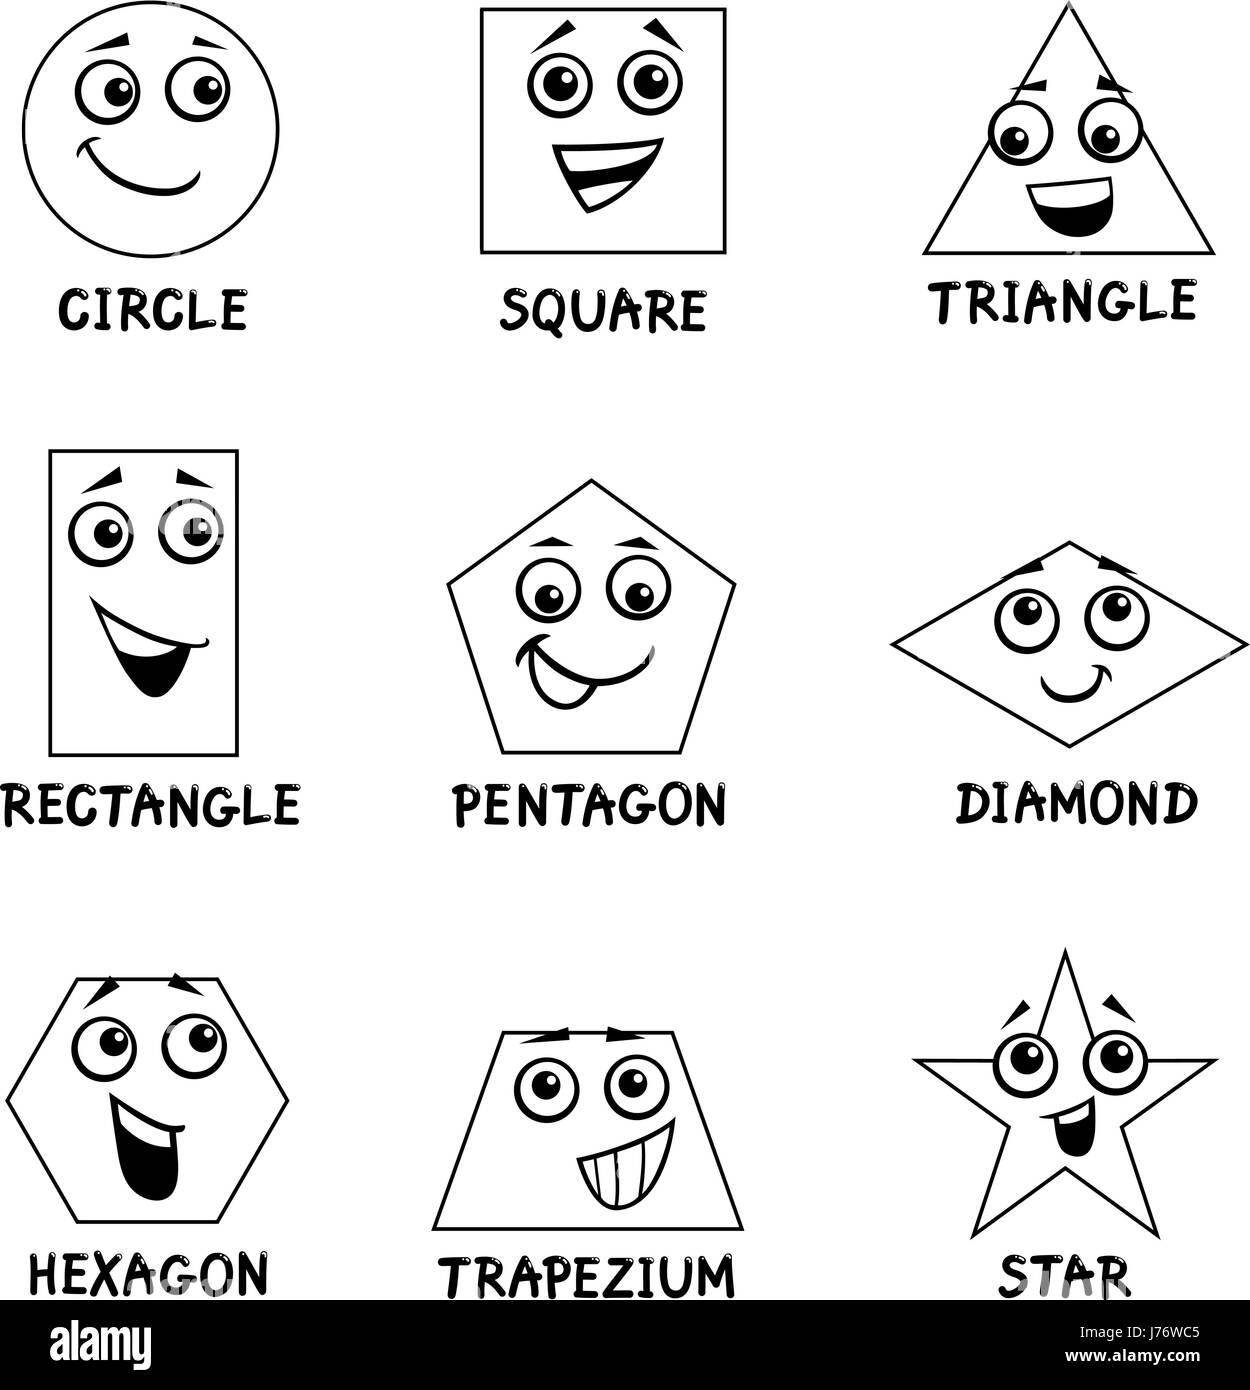 Black And White Cartoon Illustration Of Basic Geometric Shapes Funny Stock Vector Art